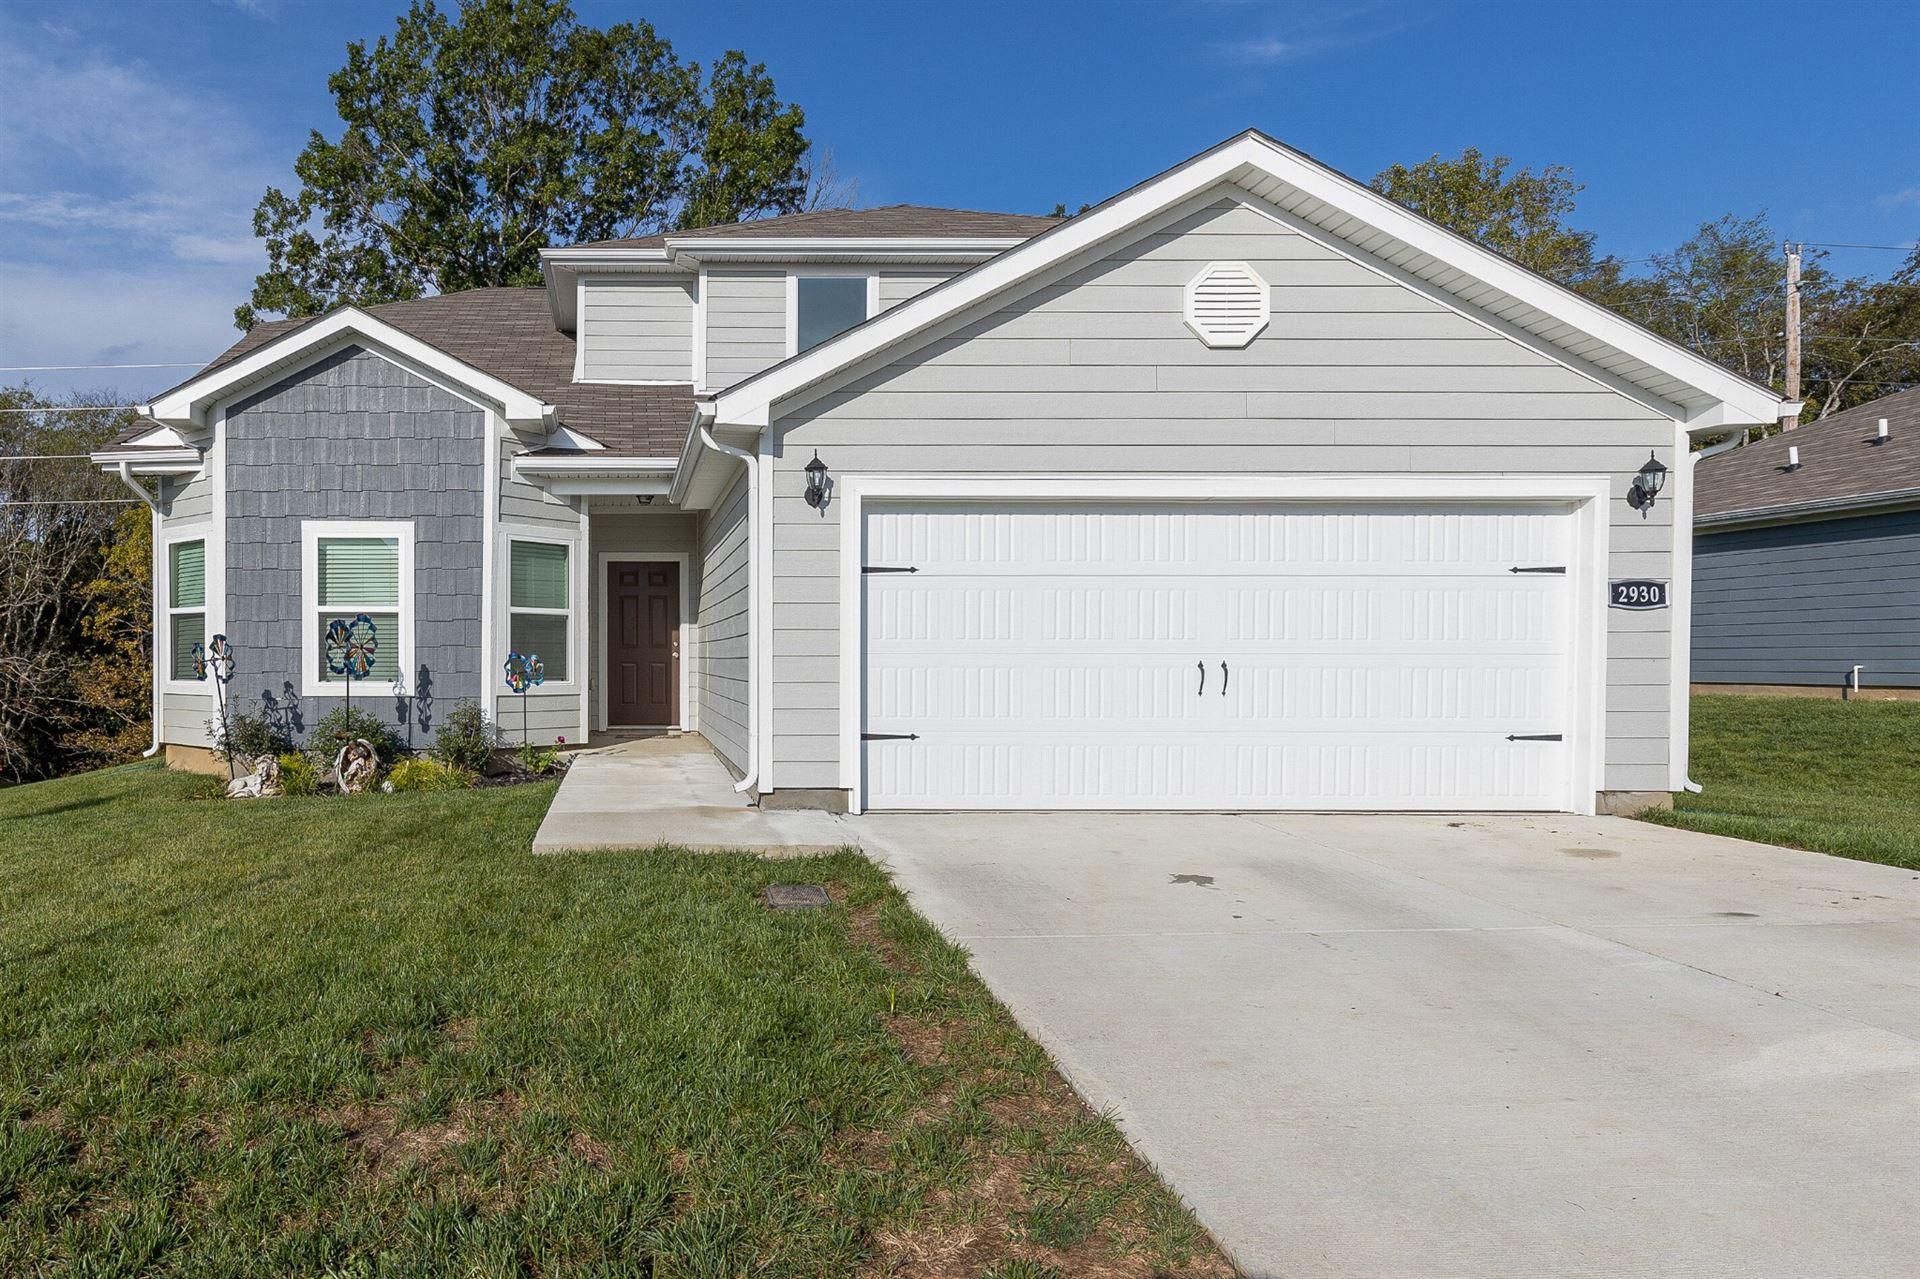 2930 Beeswax St, Columbia, TN 38401 - MLS#: 2298007